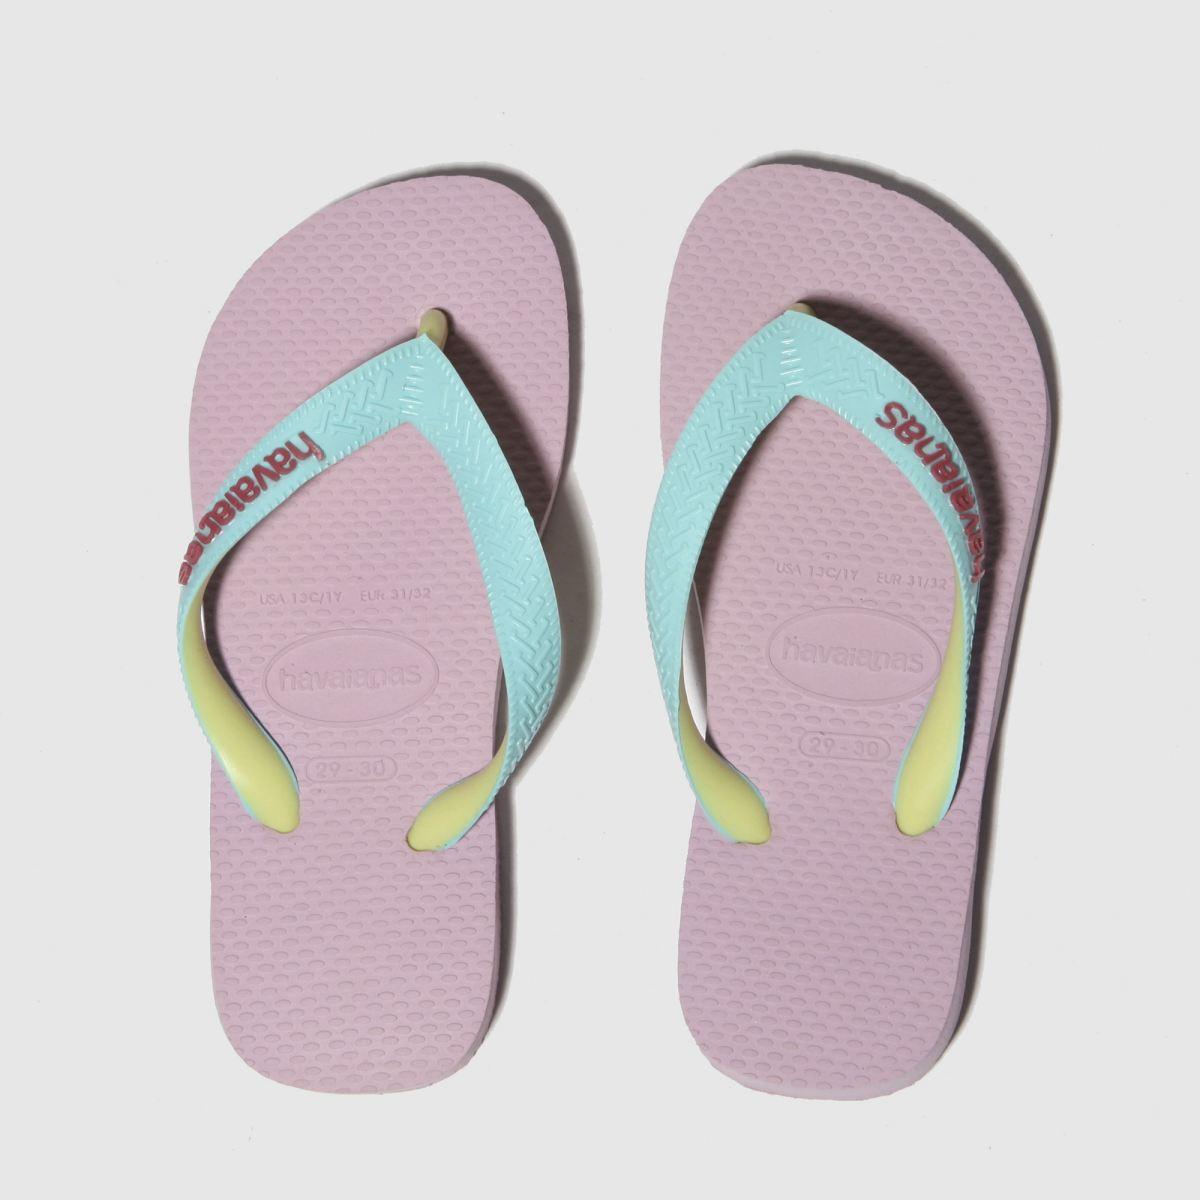 Havaianas Pale Pink Top Mix Sandals Junior